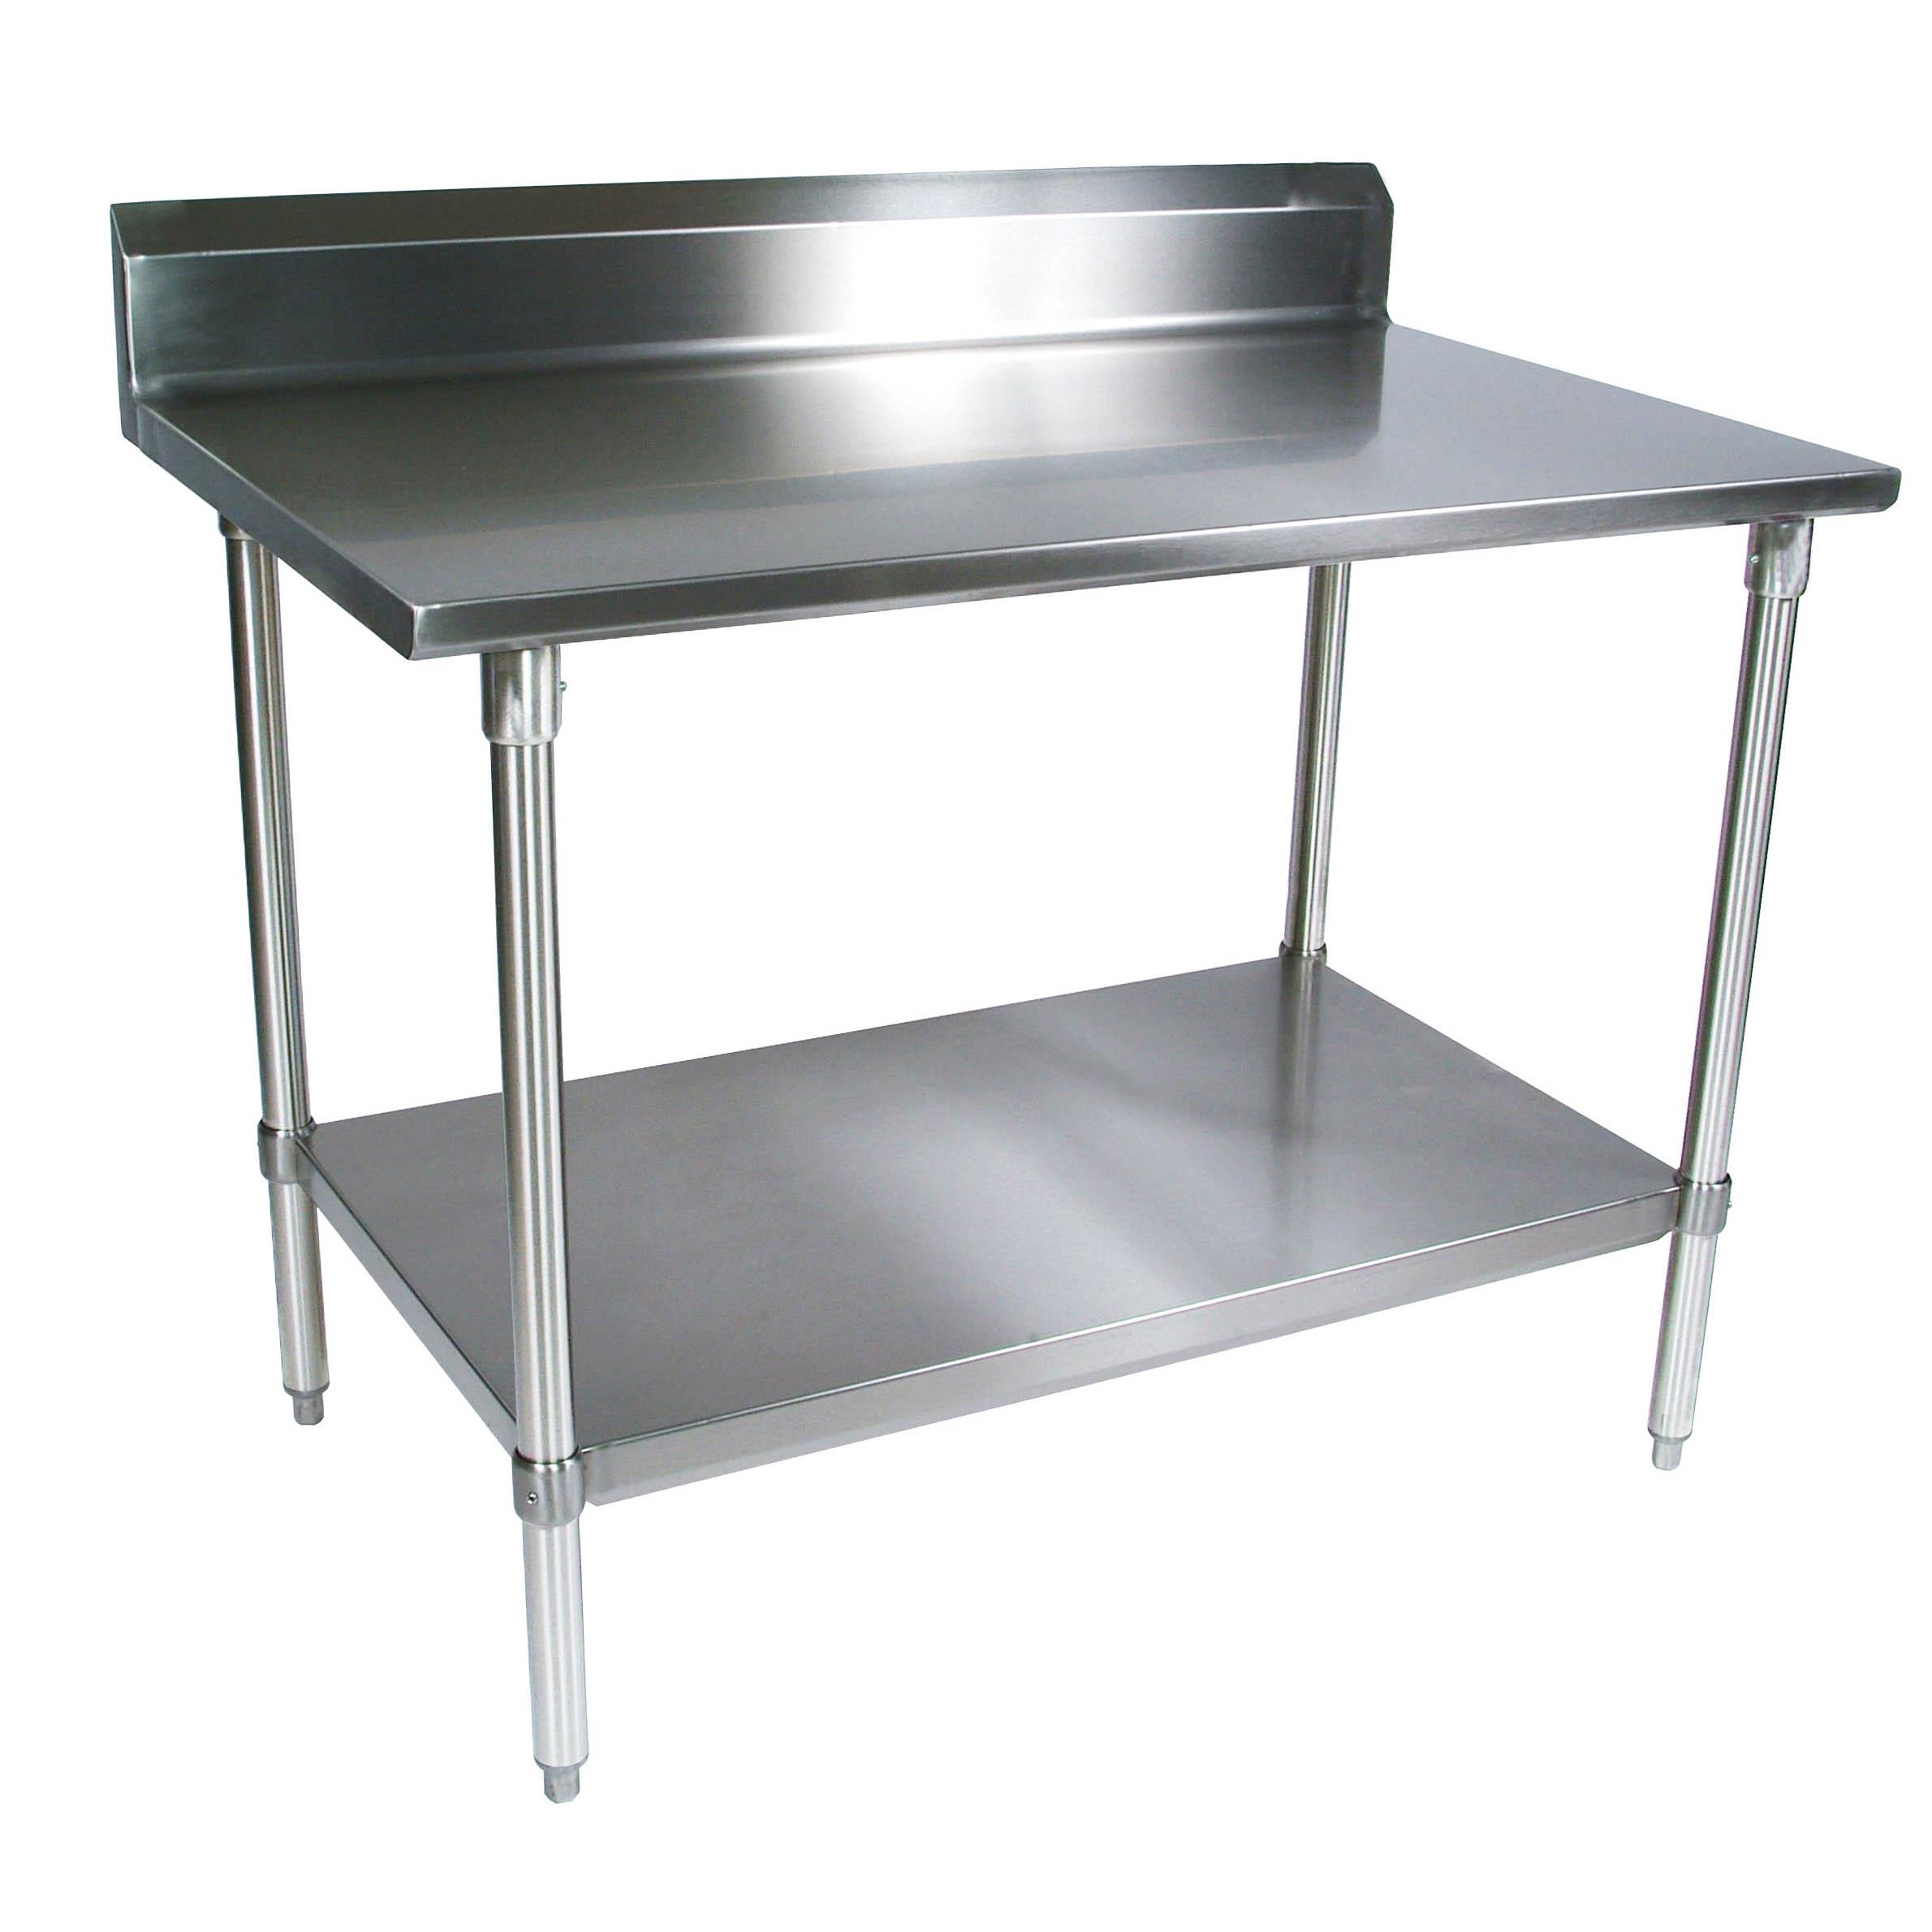 BK Resources CTTR5-6030 work table,  54